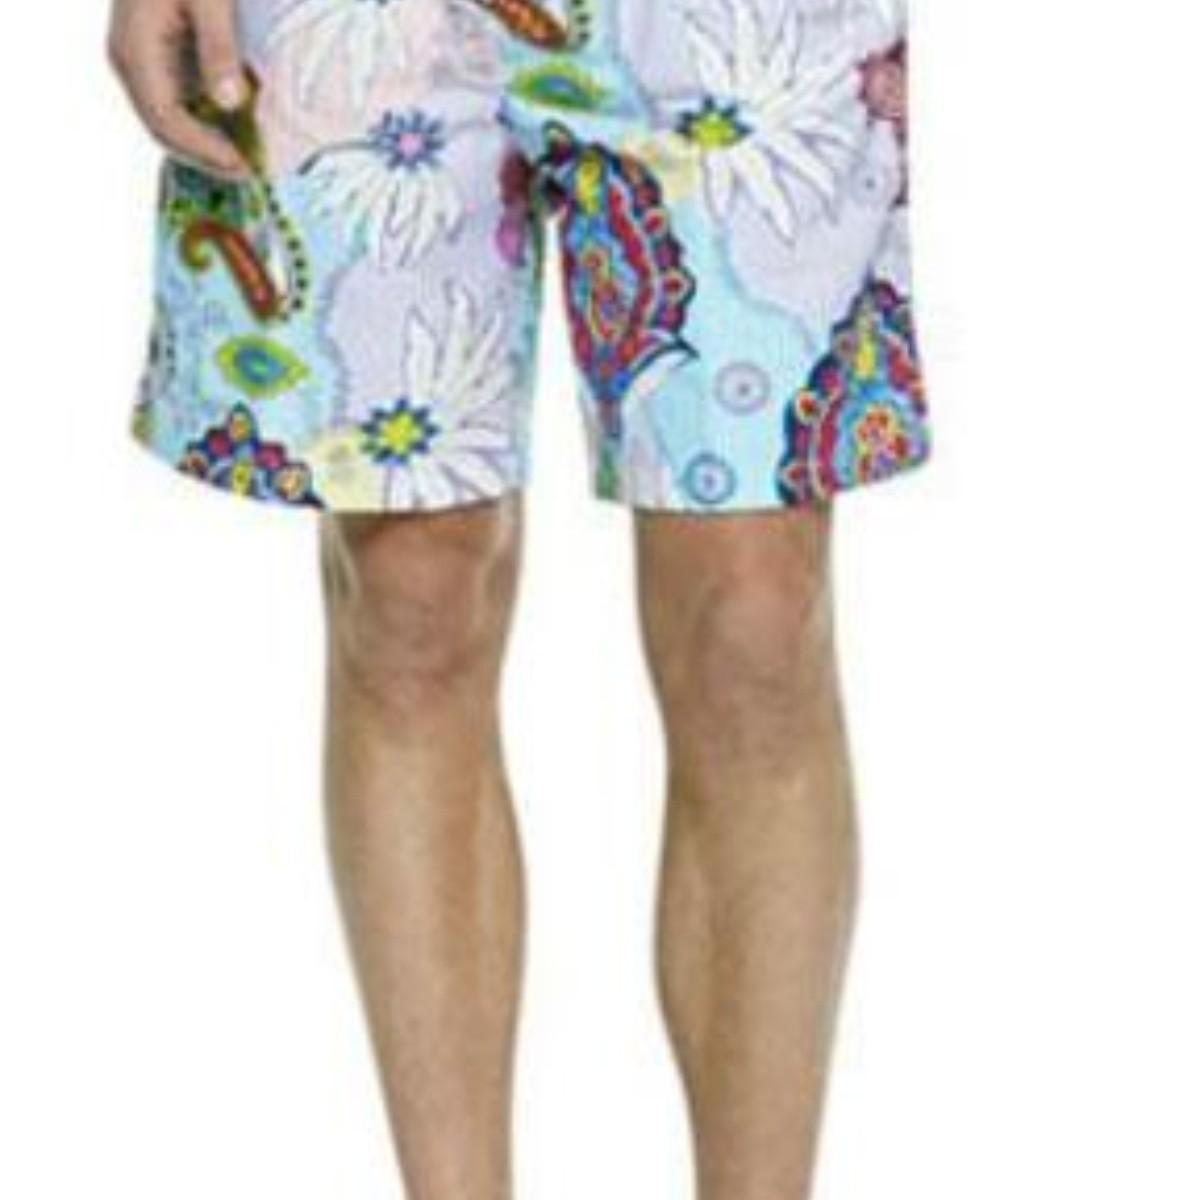 03797e39ccb8 Adiós a los bañadores cortos para hombres   ELIMPARCIAL.COM ...